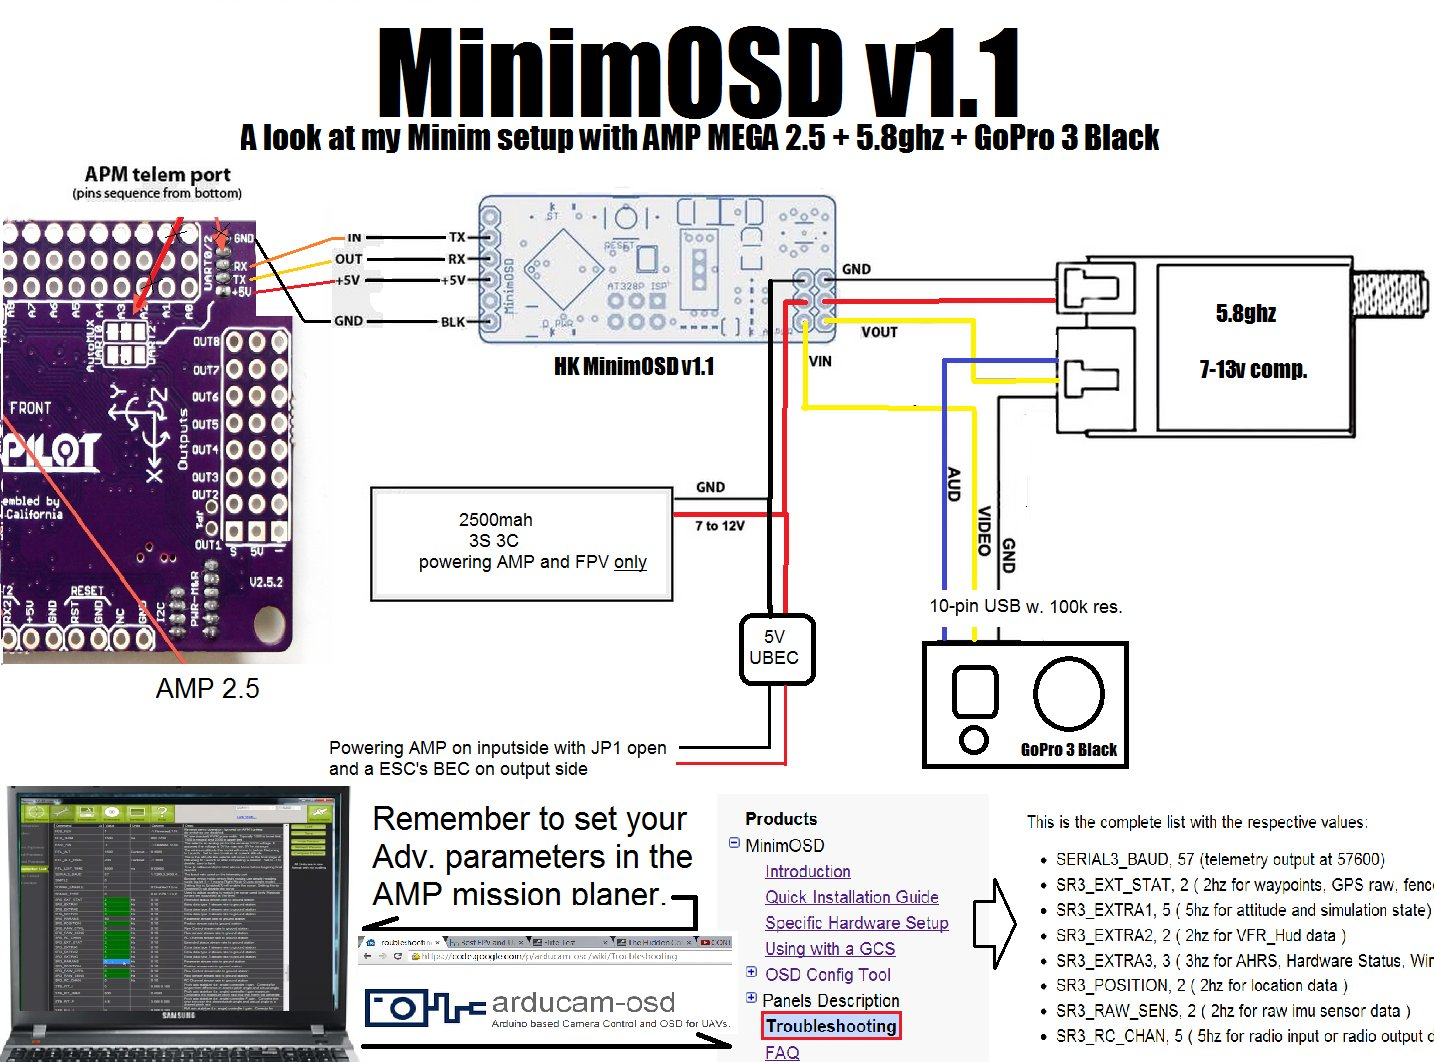 fpv wiring diagram circuit breaker panel pdf gforce rc planes new project skywalker uav part